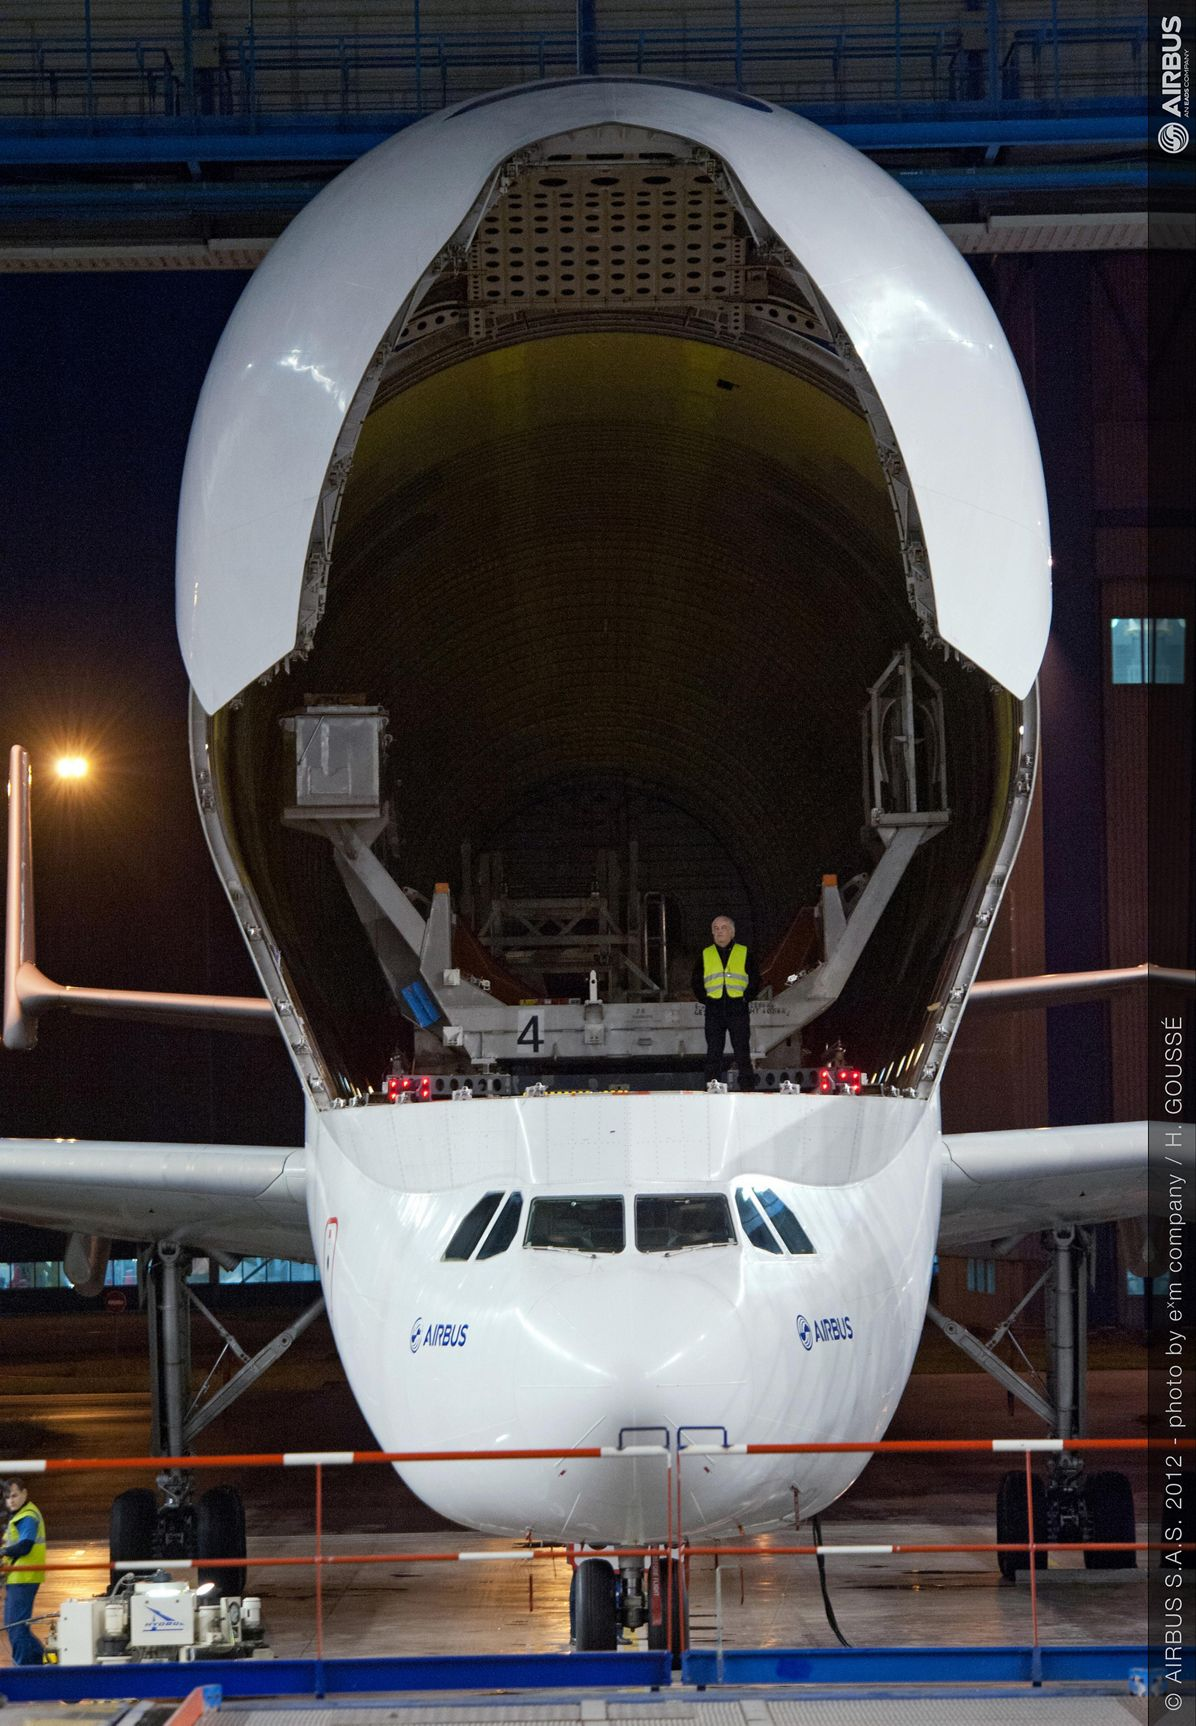 Airbus expands Beluga fleet_1